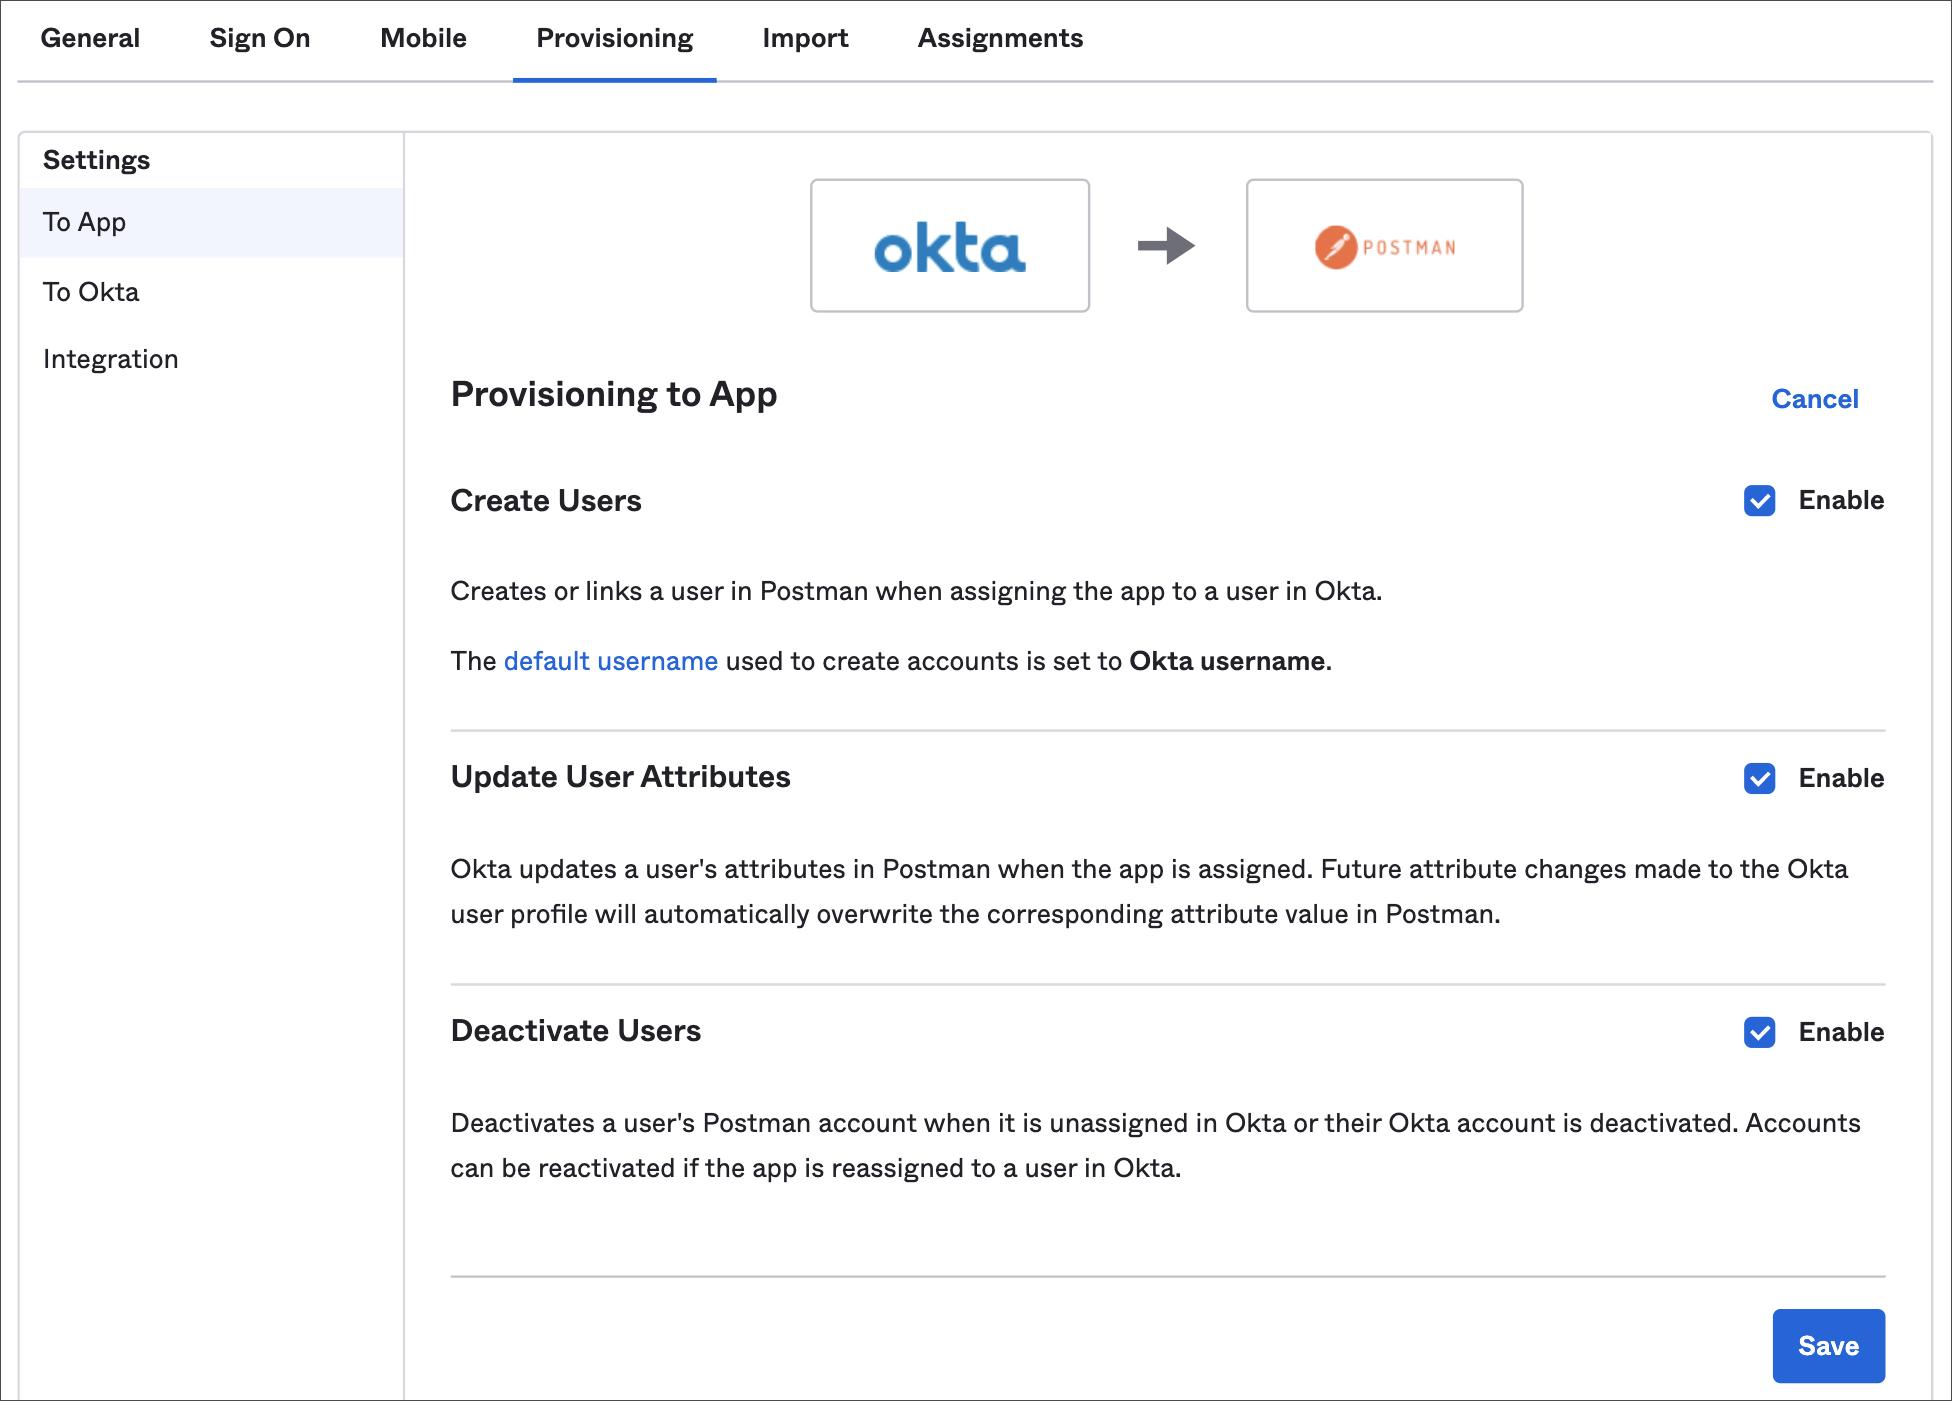 Enabled features in Okta's Postman app